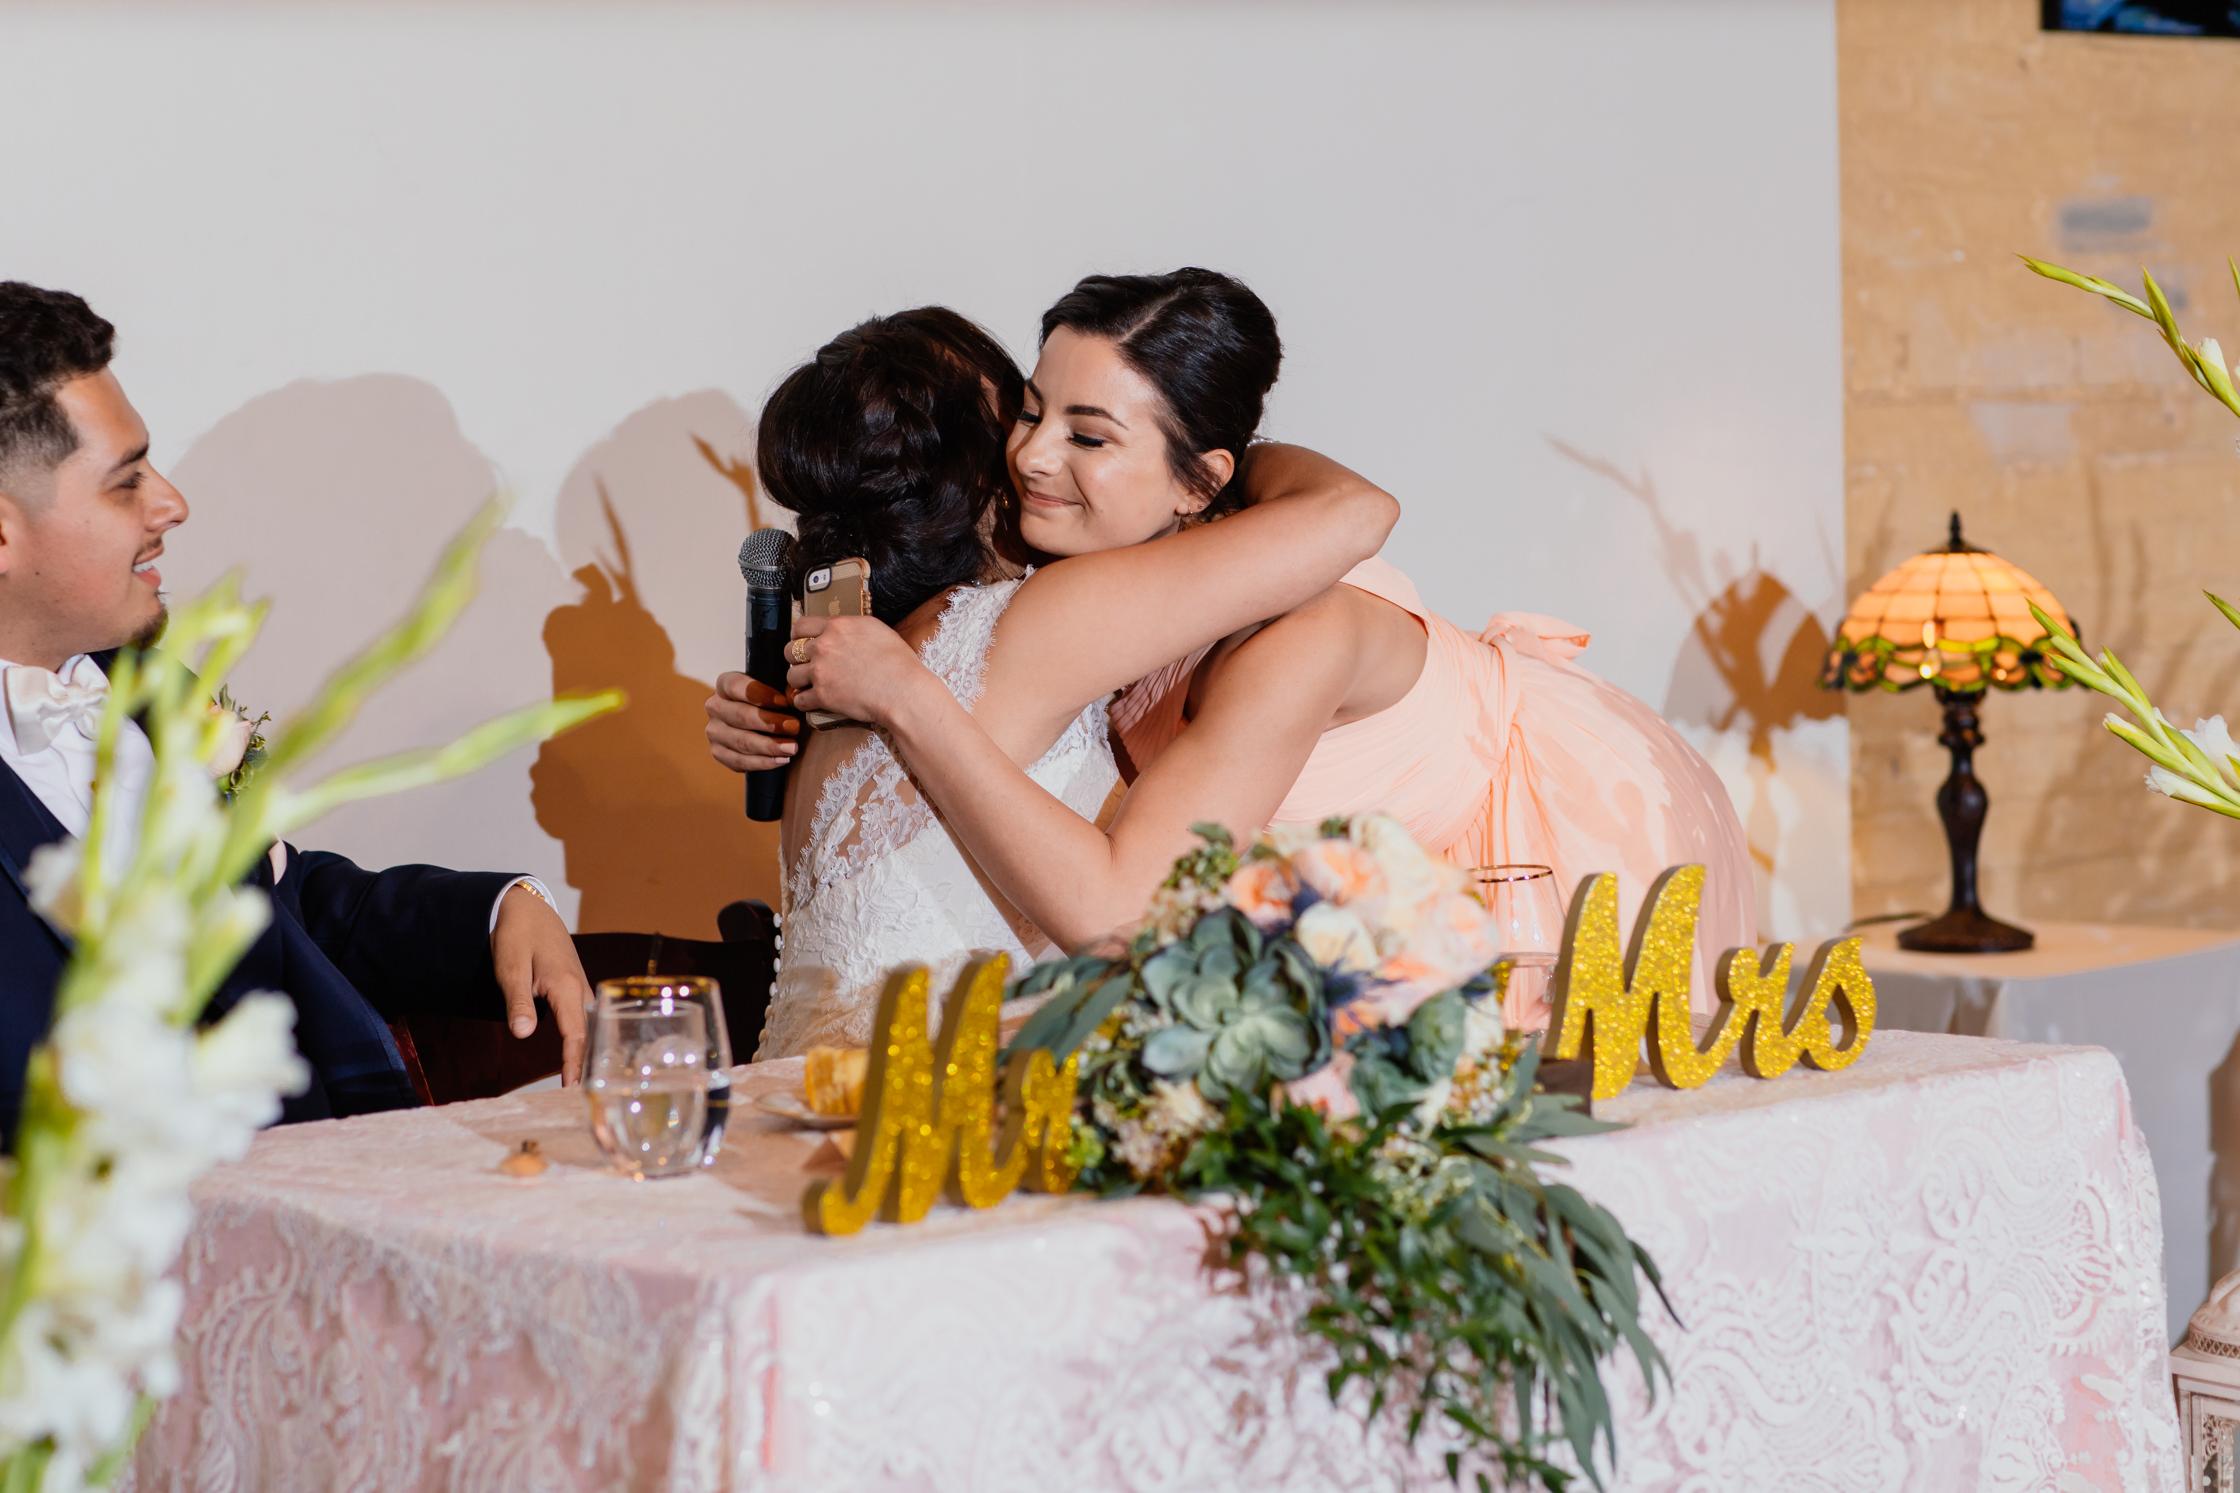 luis_joanna_wedding-90.jpg